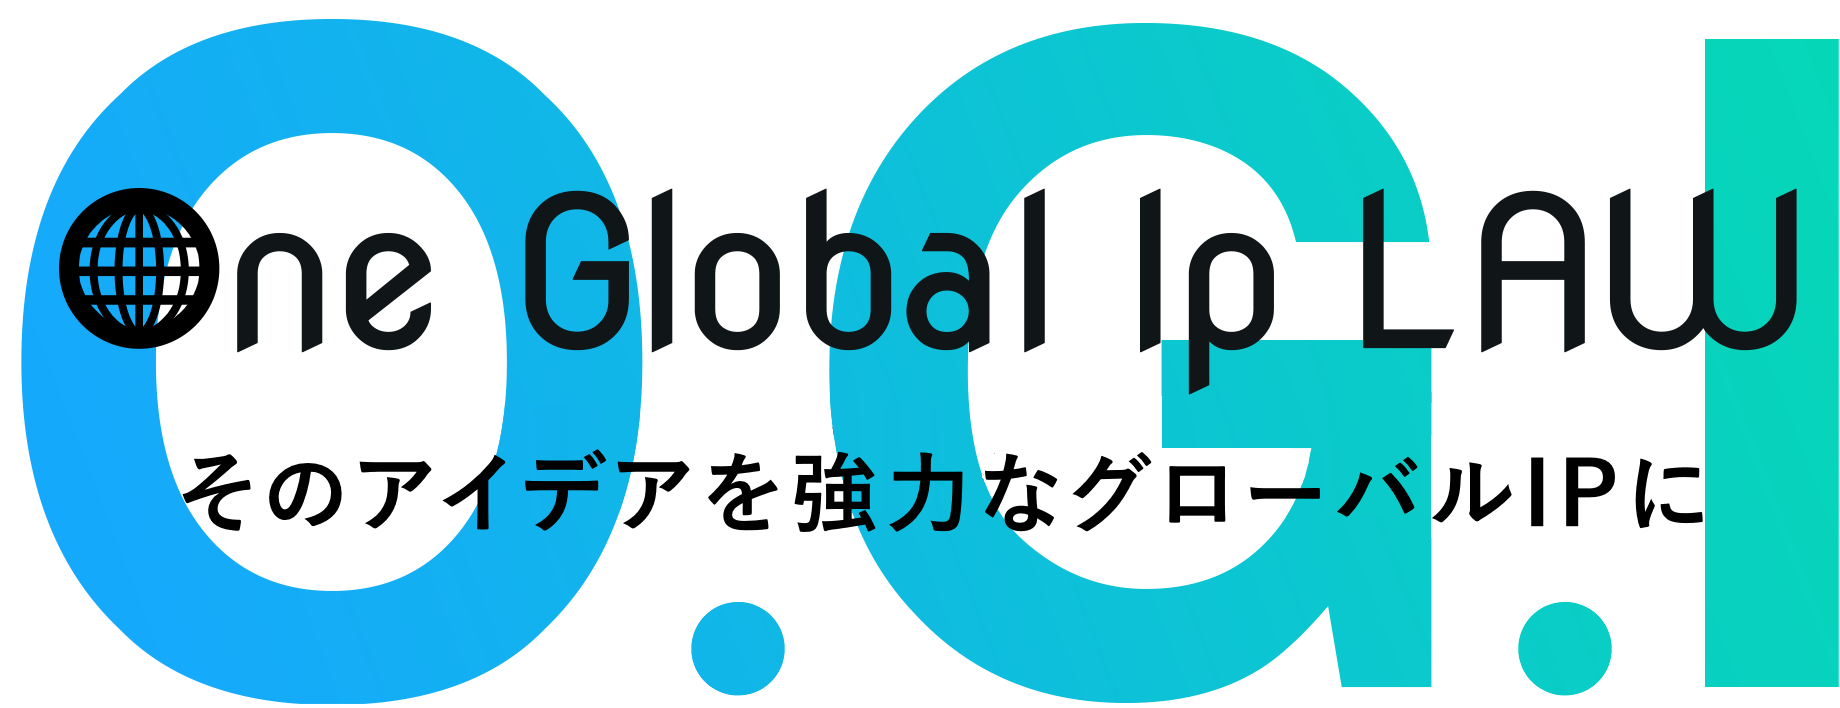 One Global Ip 特許事務所 そのアイデアを強力なグローバルIPに